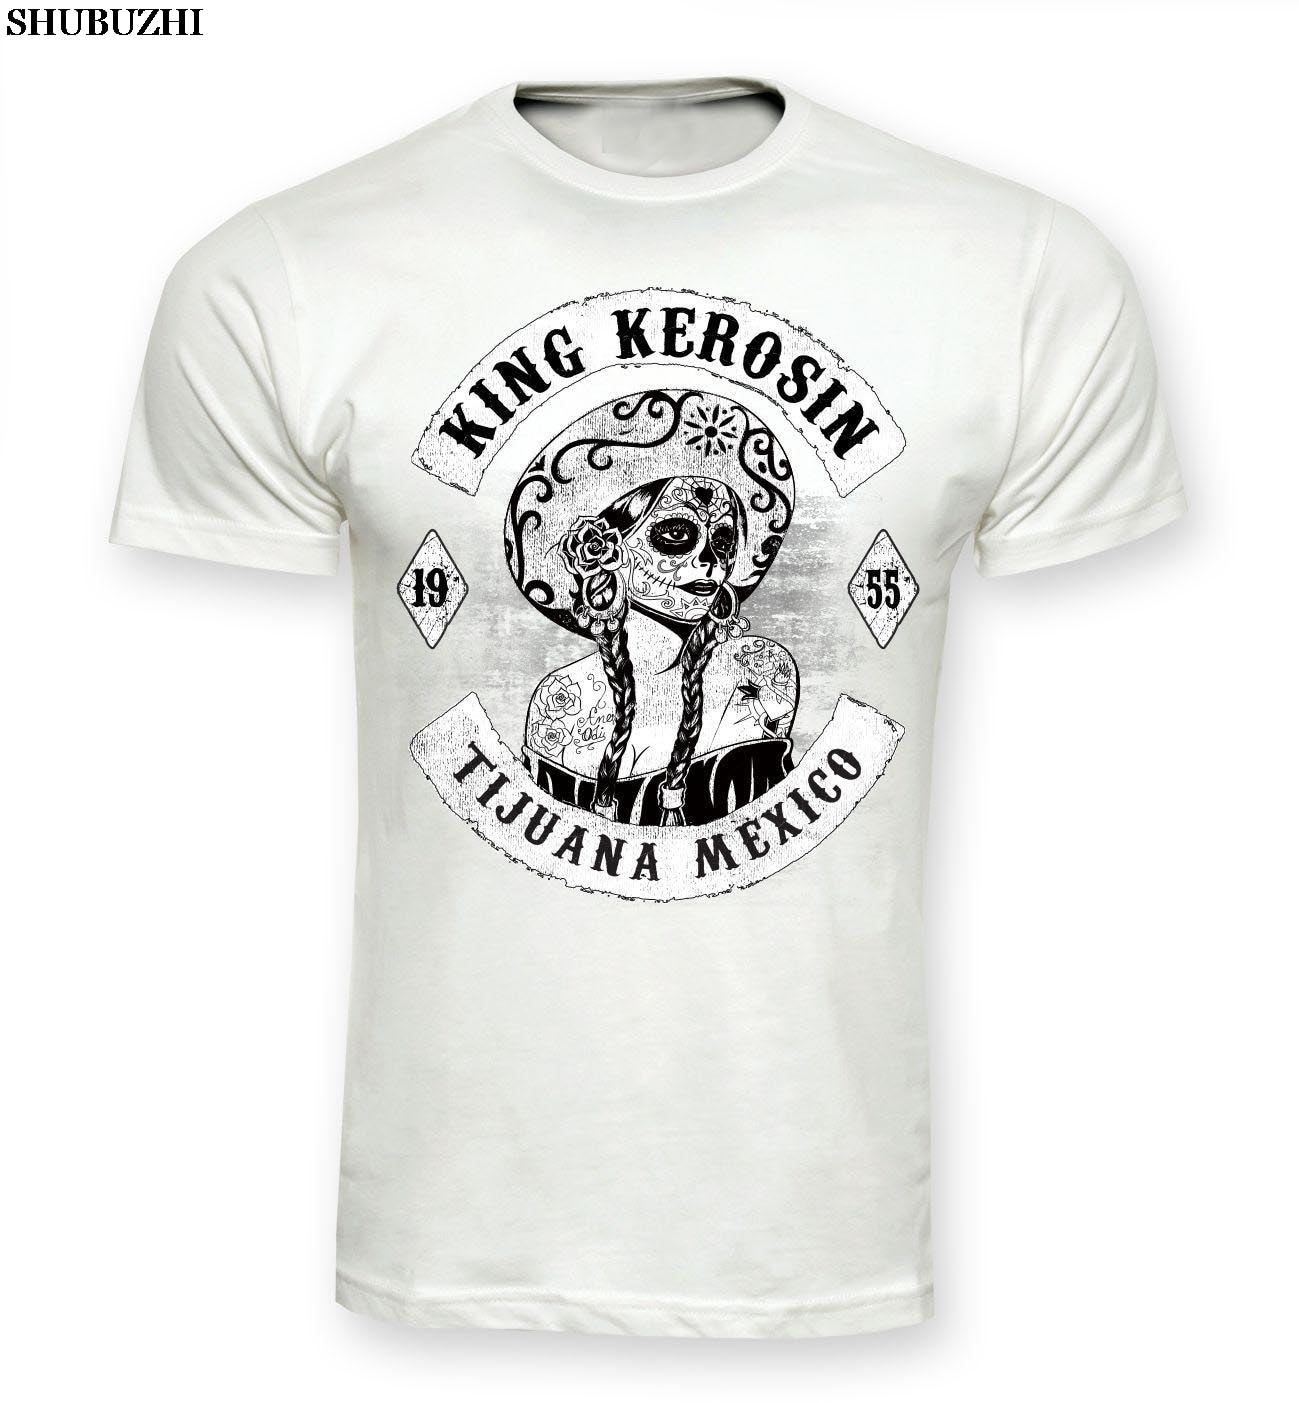 Hombres shubuzhi algodón Top camisetas de manga corta Camiseta Tijuana México azúcar calavera Vintage Pinup 1955 Rockabilly v8algodón camiseta